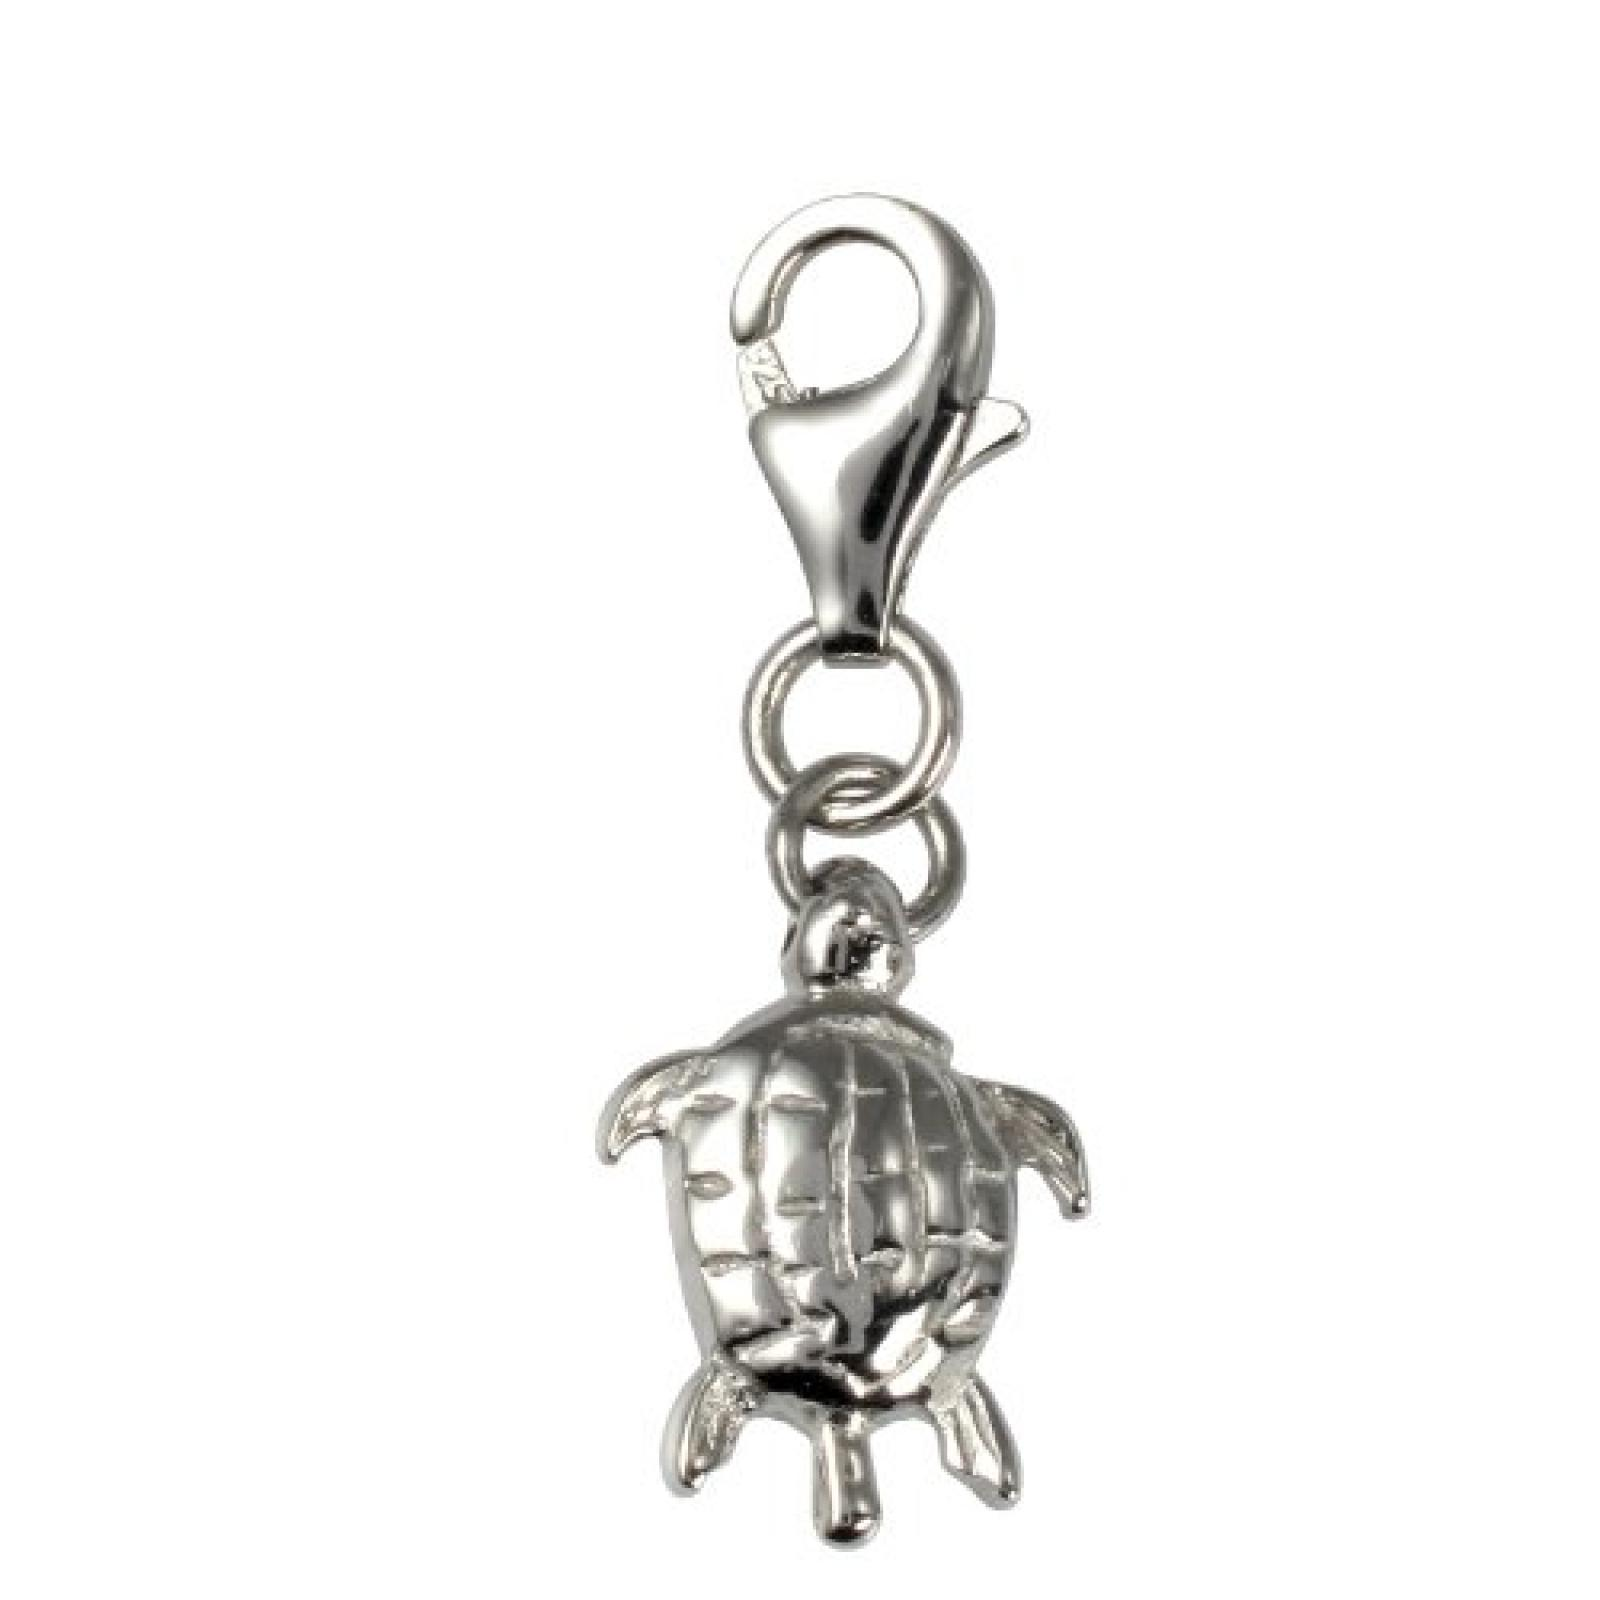 Amor Damen Schildkröte-Charm  925 Sterlingsilber 25 mm 165532